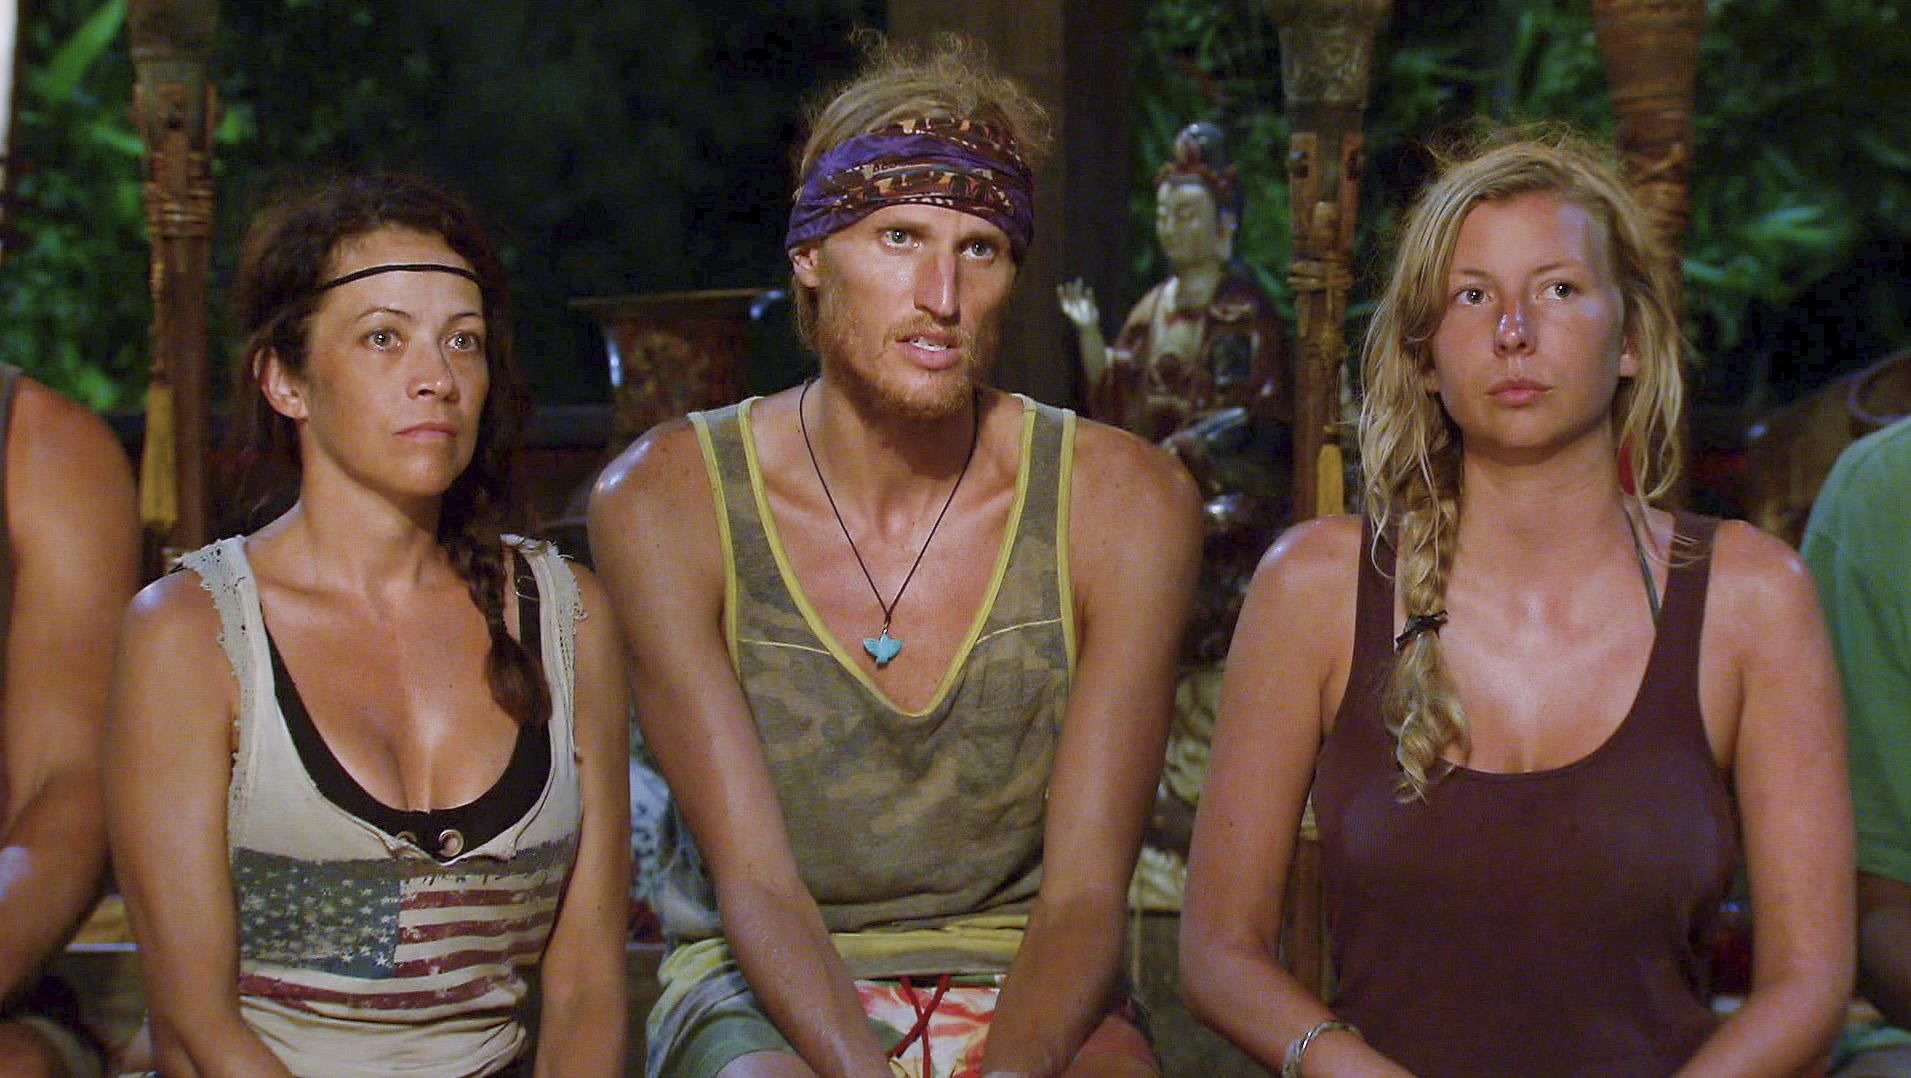 Laura, Tyson and Katie in Season 27 Episode 10